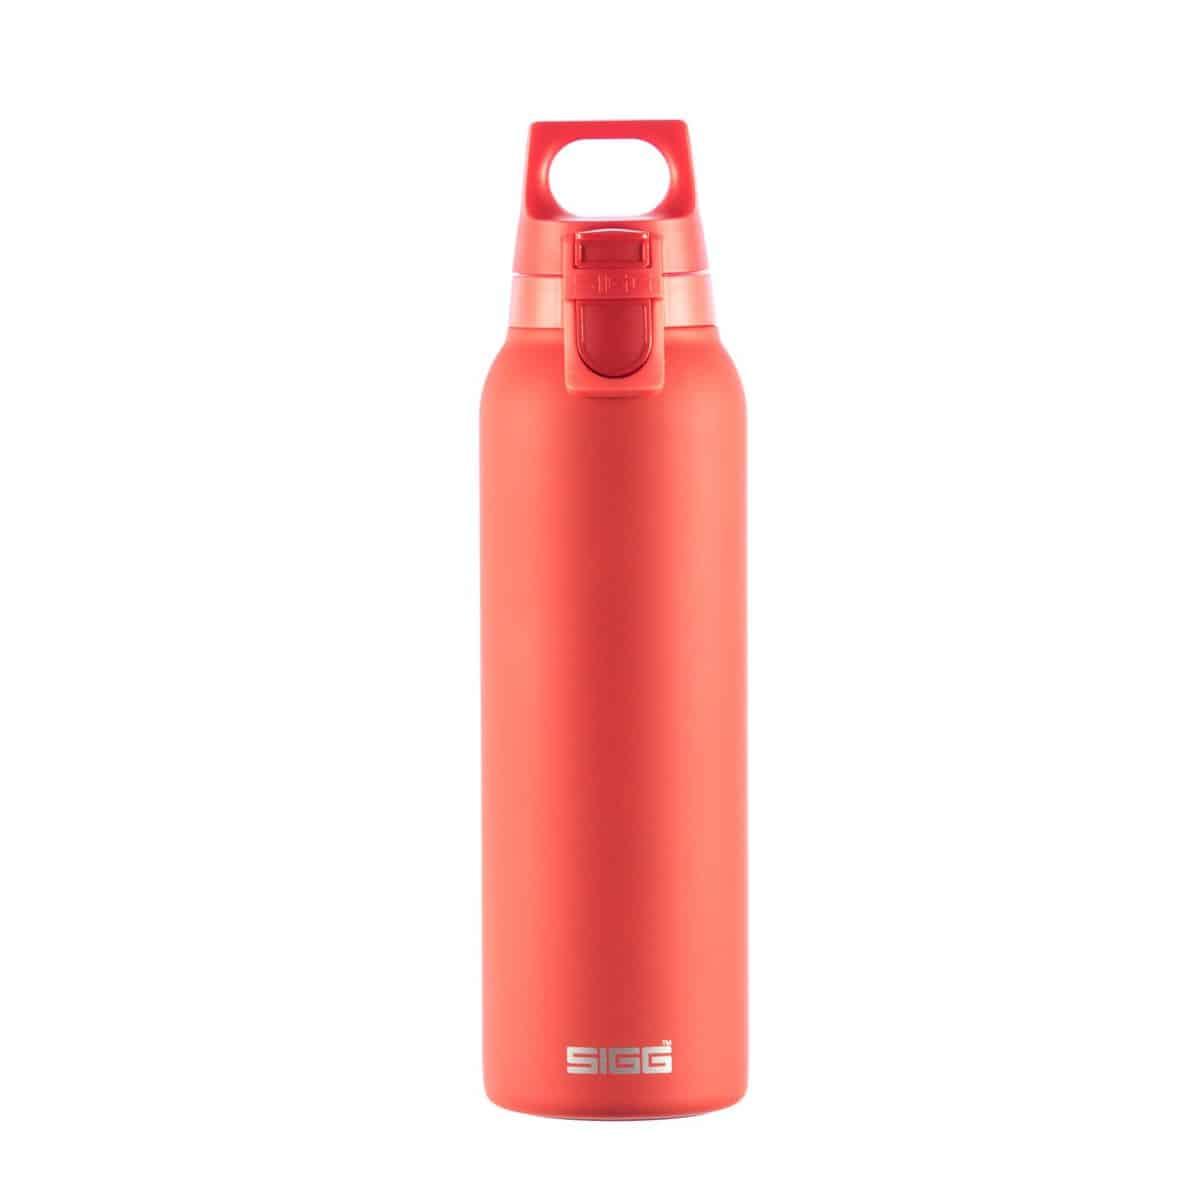 SIGG Hot & Cold ONE 0.5 liter